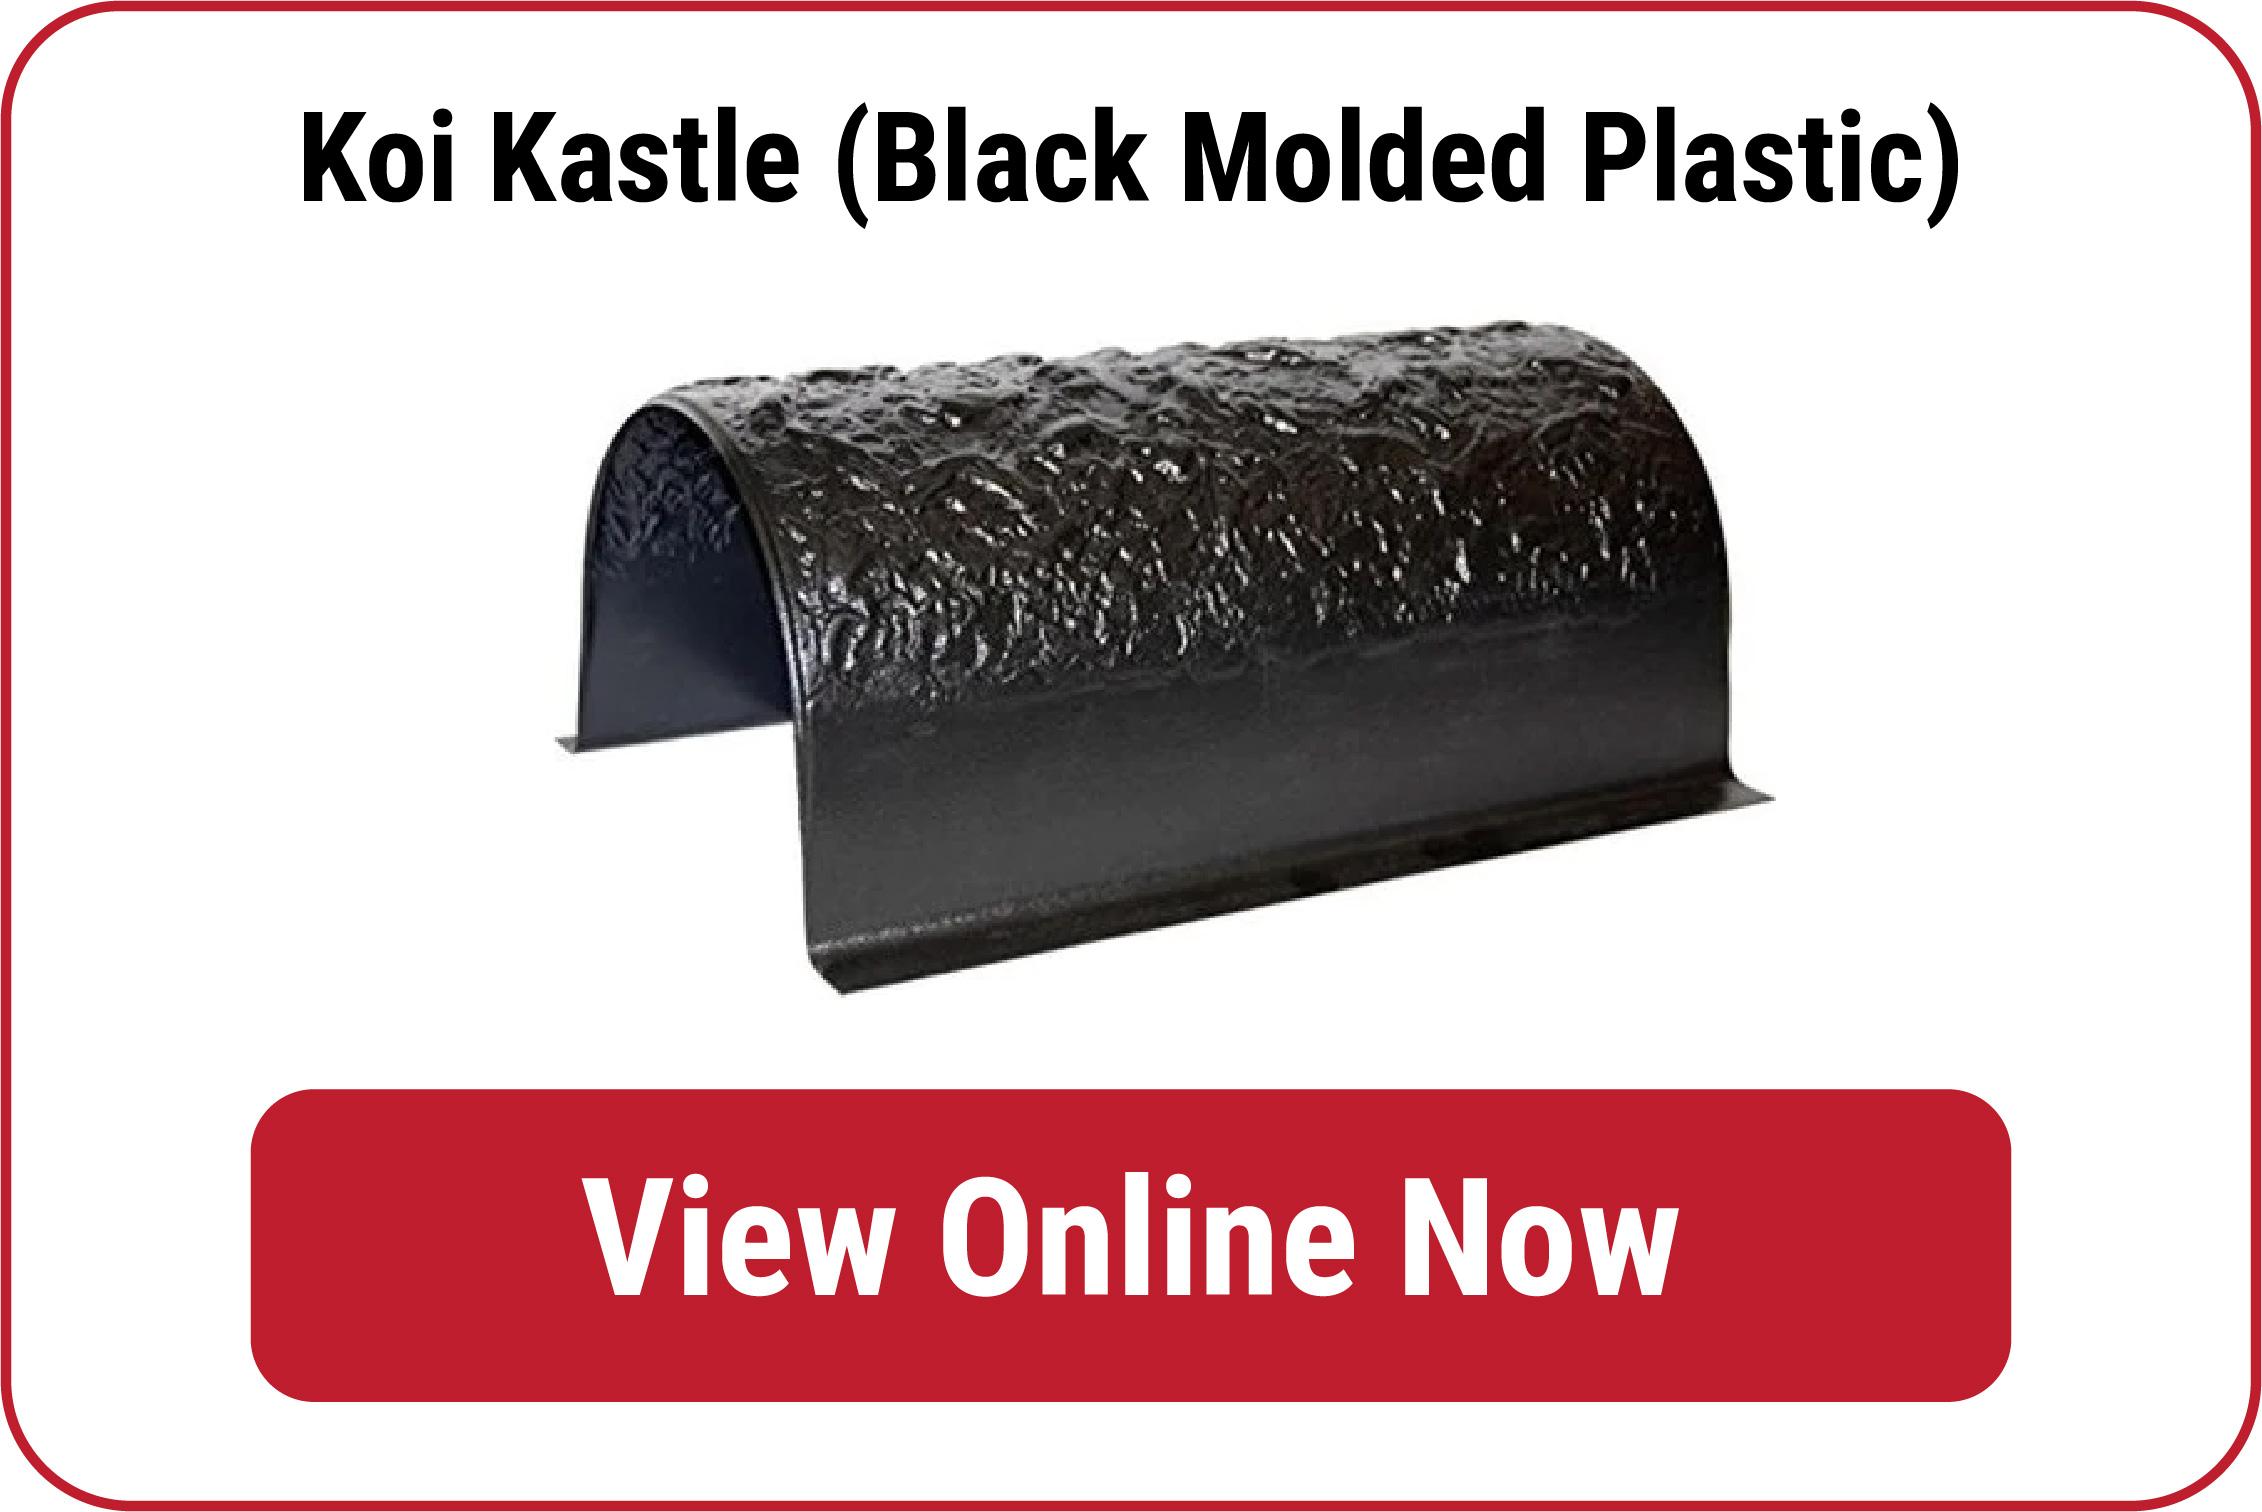 Plastic Koi Kastle   Koi Fish Protection & Shade